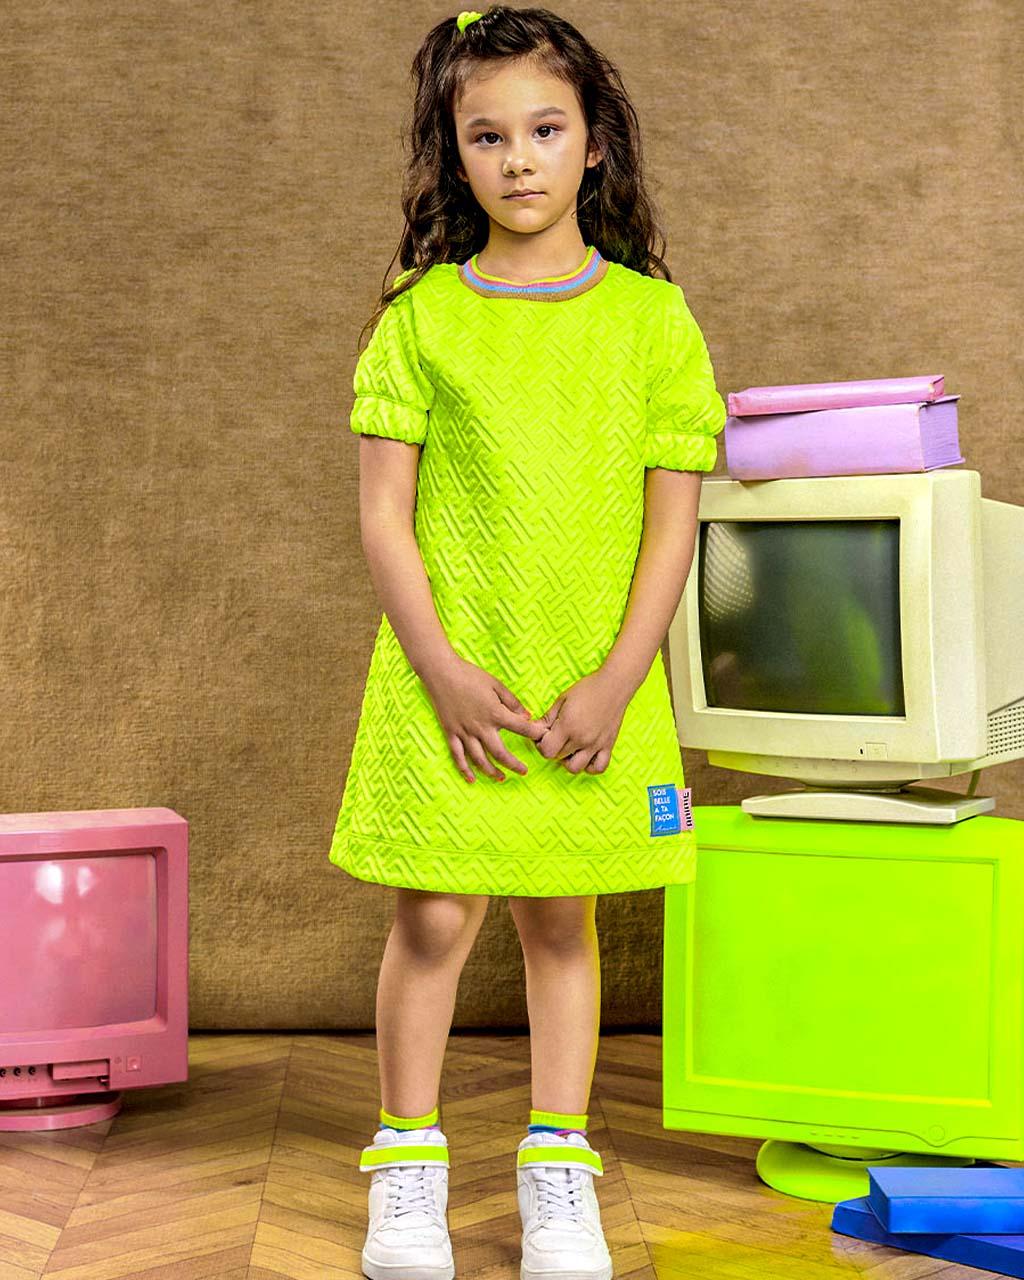 Vestido Infantil Neoprene Amarelo Neon com Gola Colorida Animê